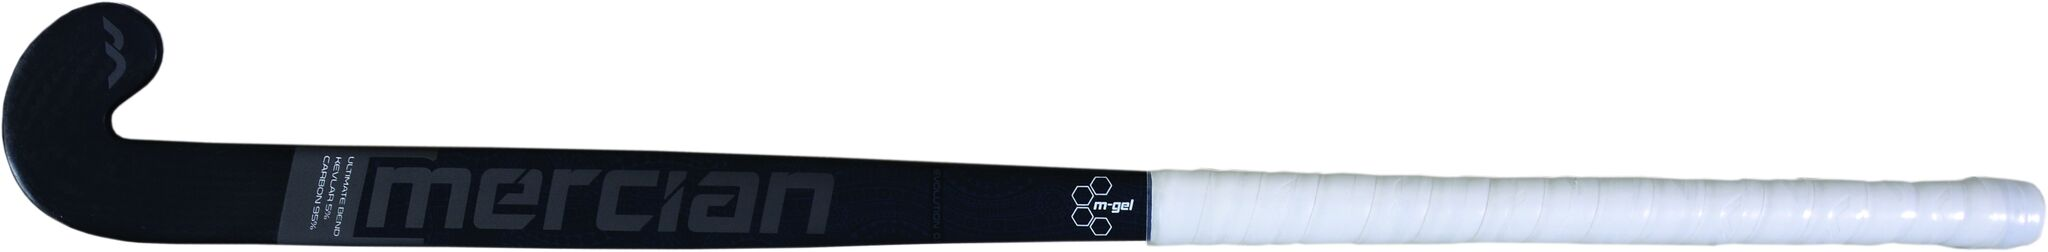 Mercian Evolution 0.1 Ultimate bow hockeystick 18-19